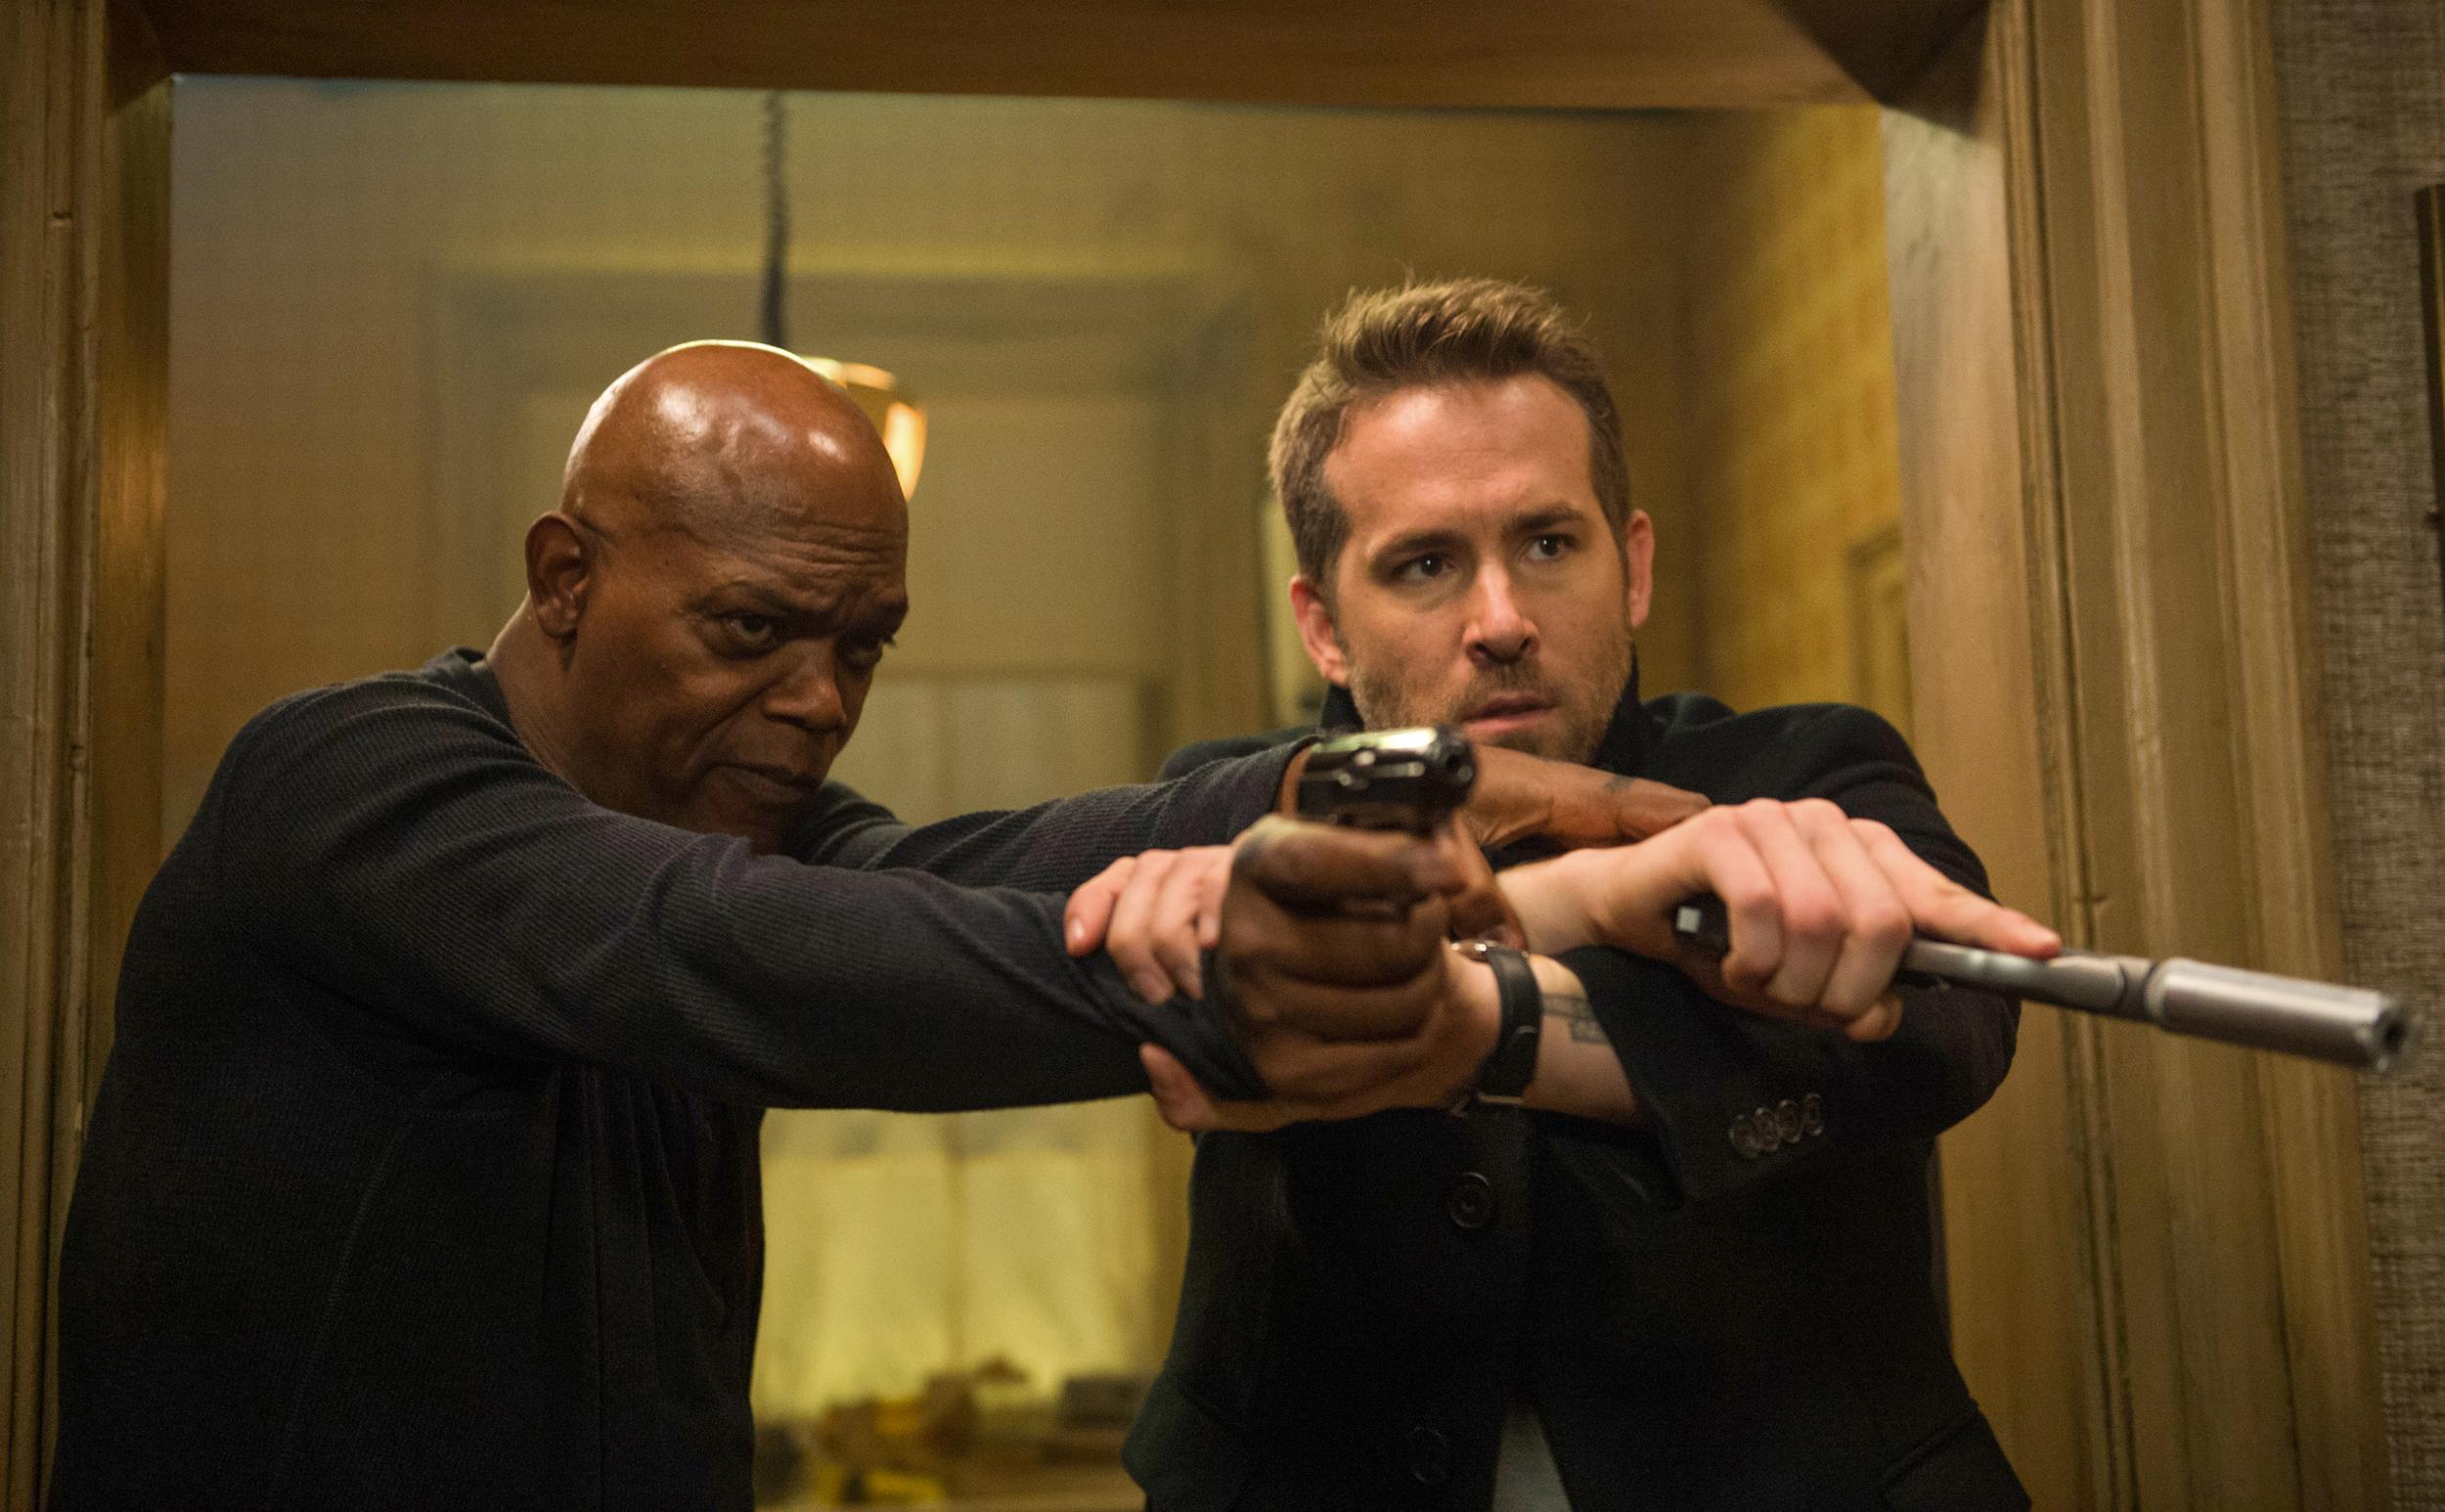 'The Hitman's Bodyguard' Slays 'Logan Lucky' at Box Office